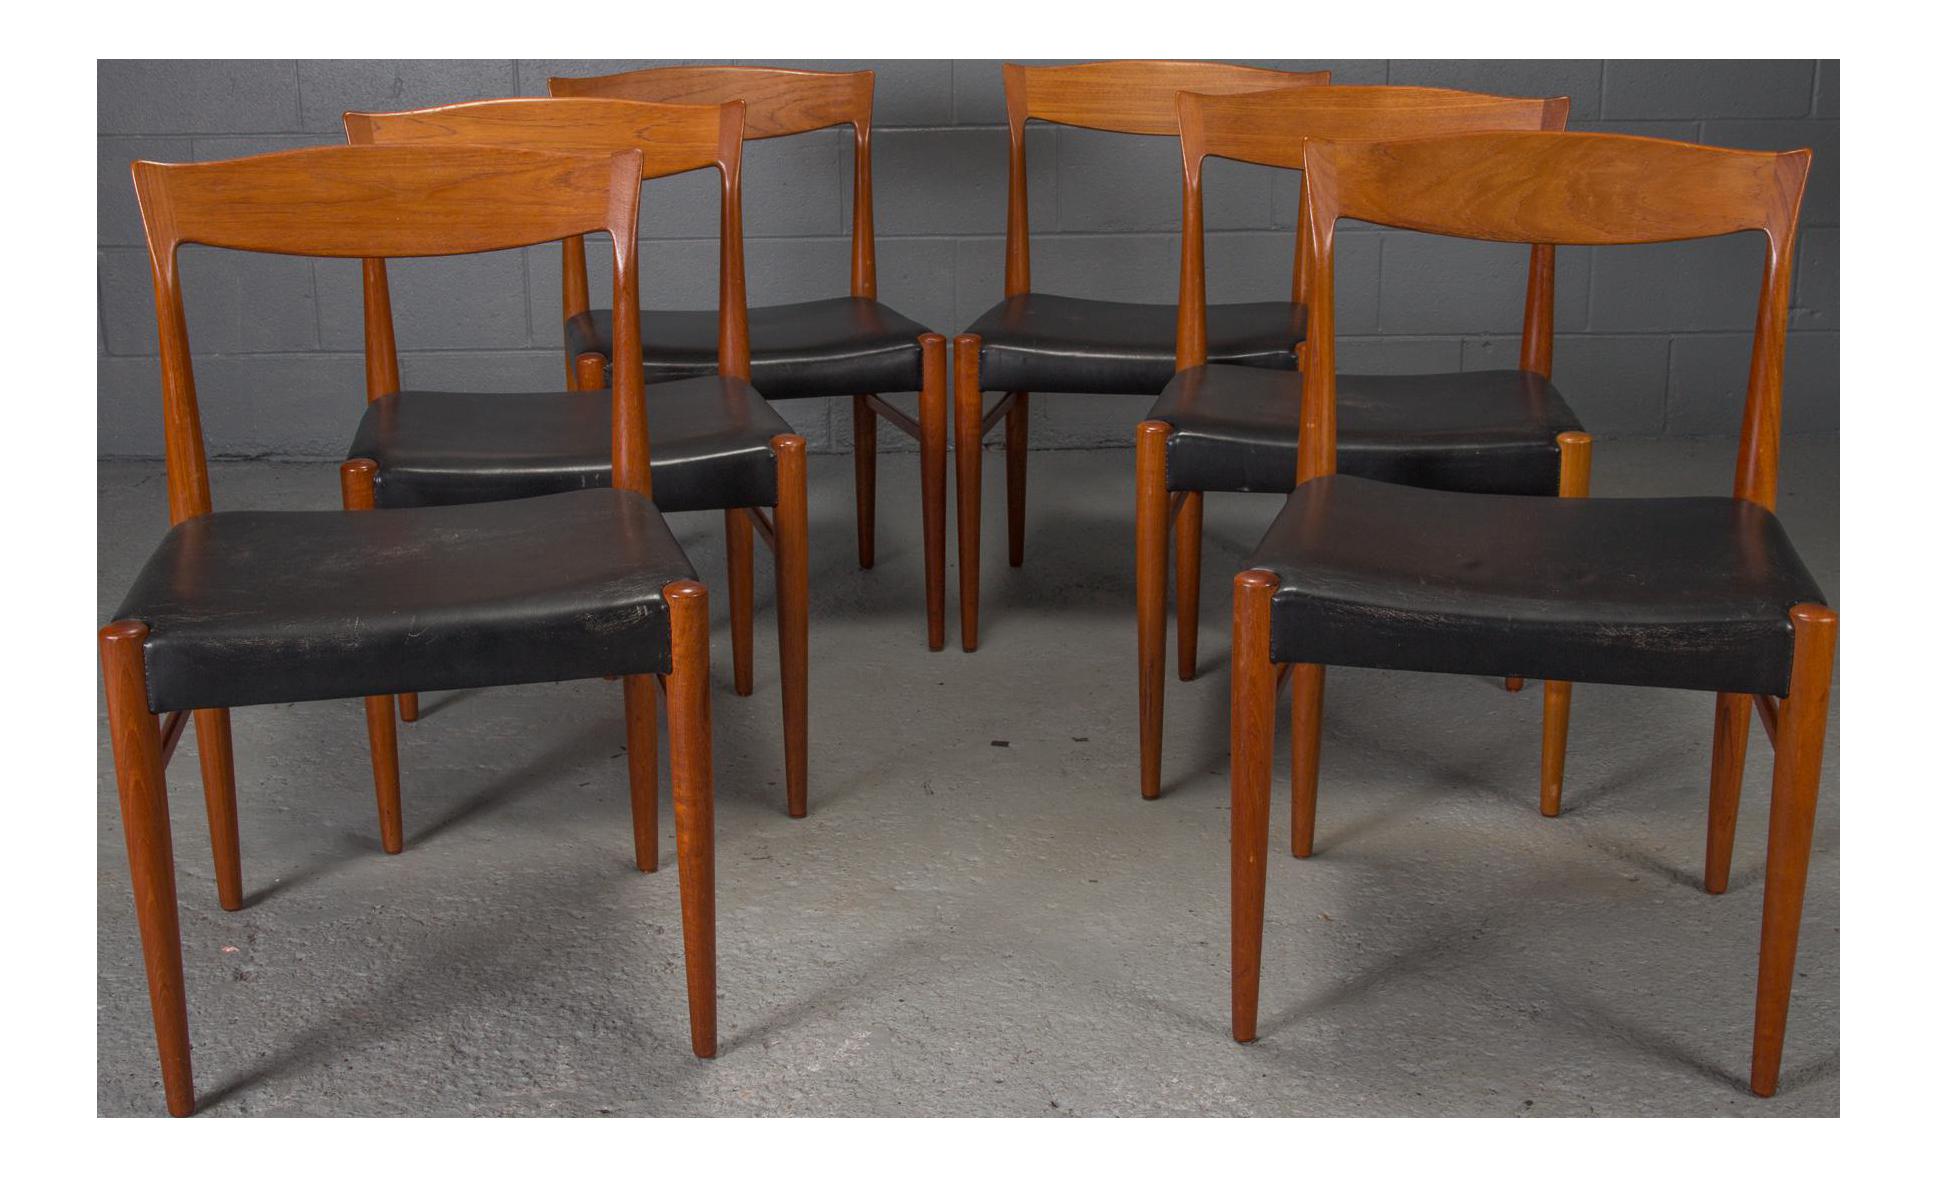 Teak Danish Modern Dining Chairs By Henning Kjaernulf   Set Of 6